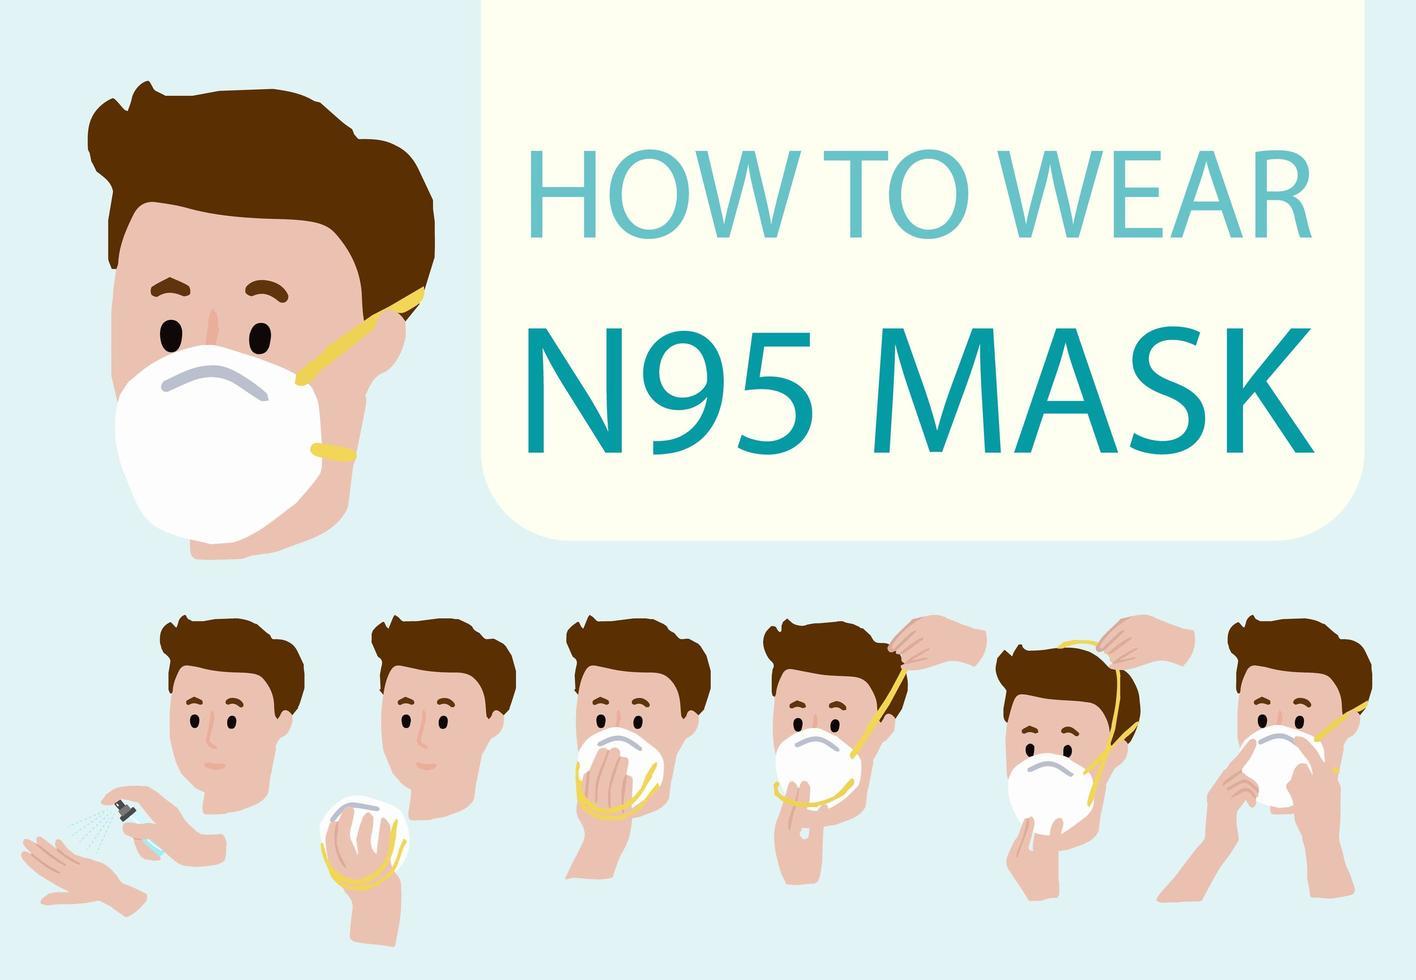 wie man n95 Maskenplakat richtig trägt vektor